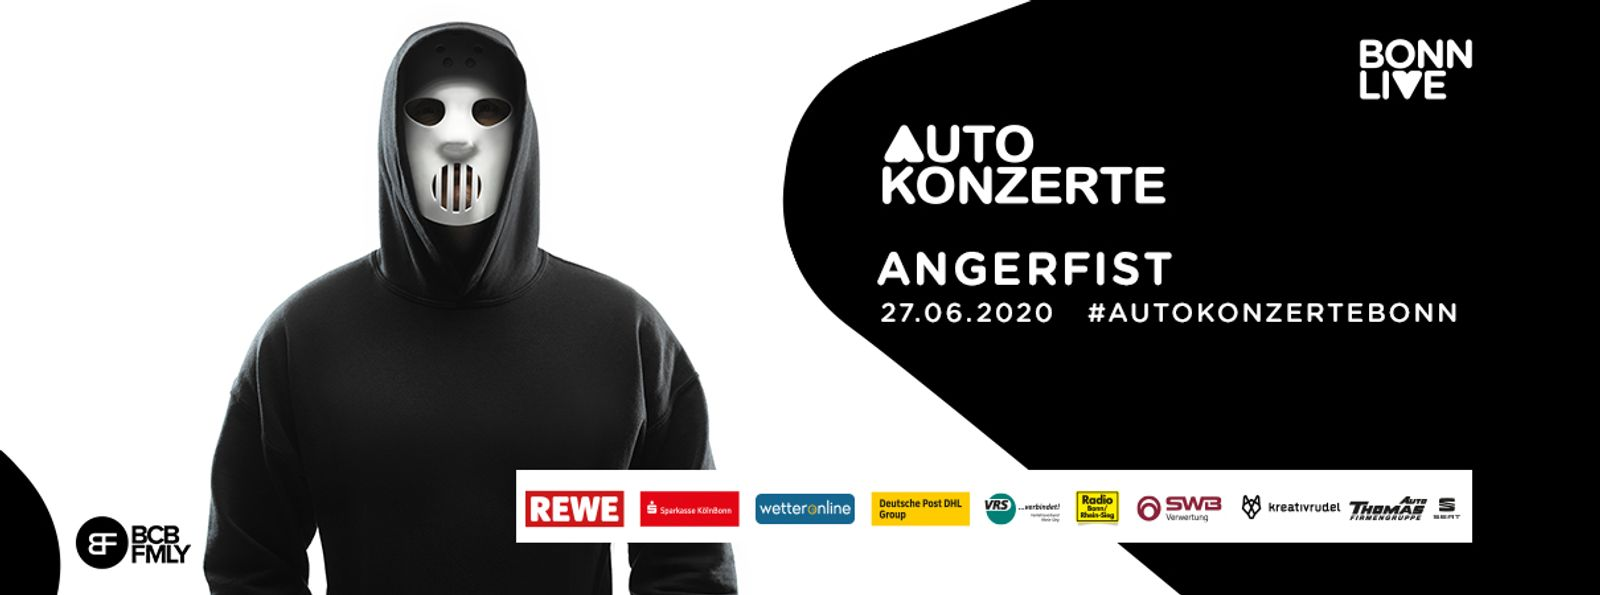 Angerfist   BonnLive Autokonzerte